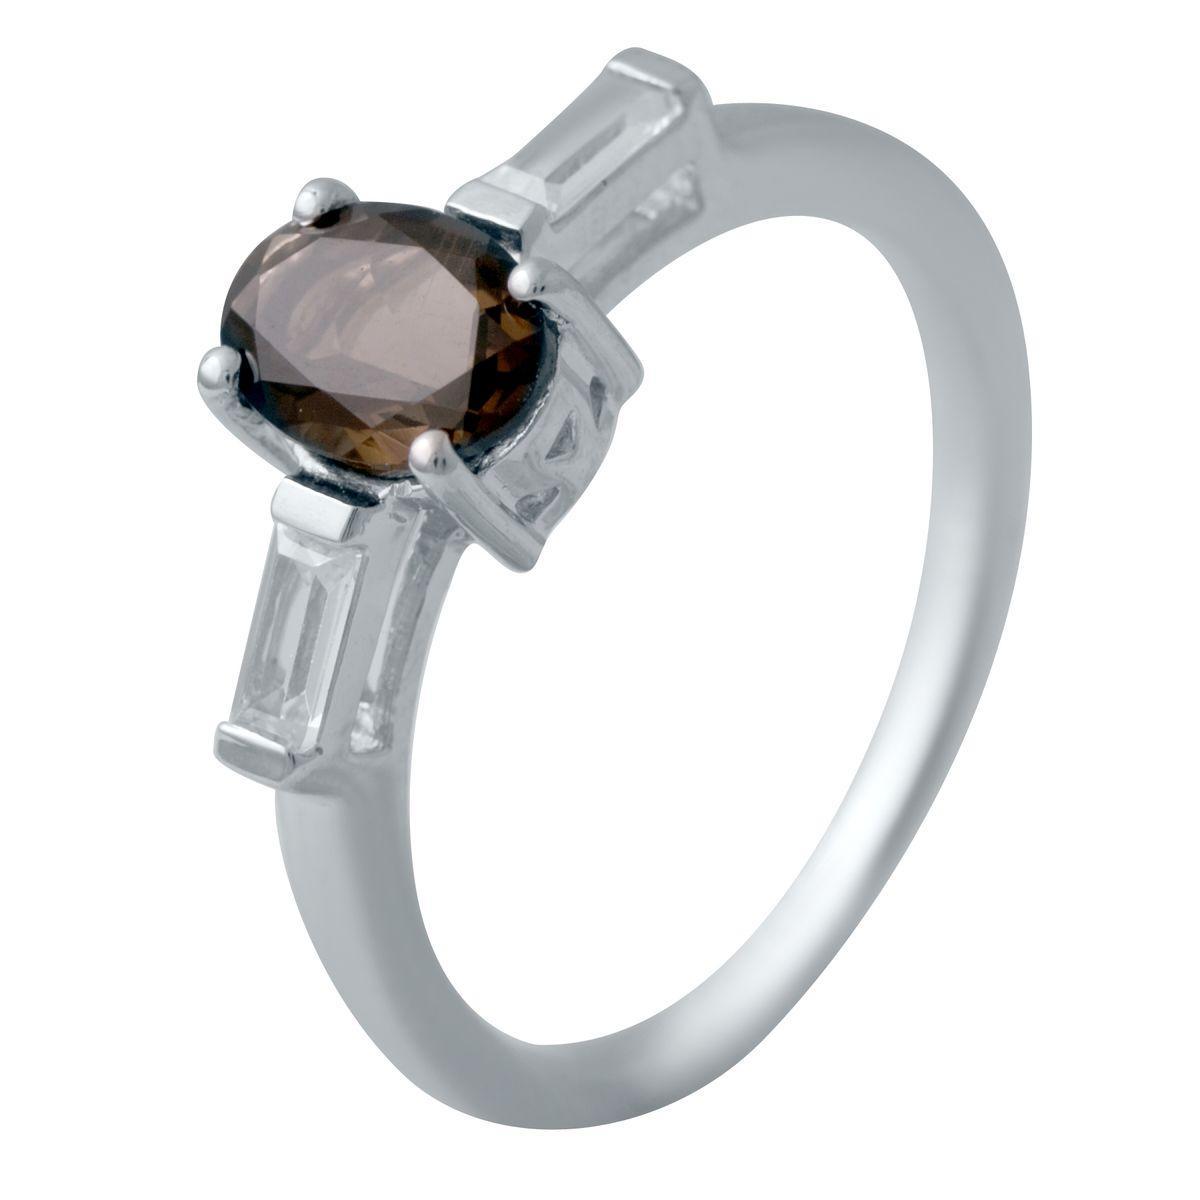 Серебряное кольцо pSilverAlex с натуральным раухтопазом (димчатим кварцем) (2033455) 17.5 размер 2, 17